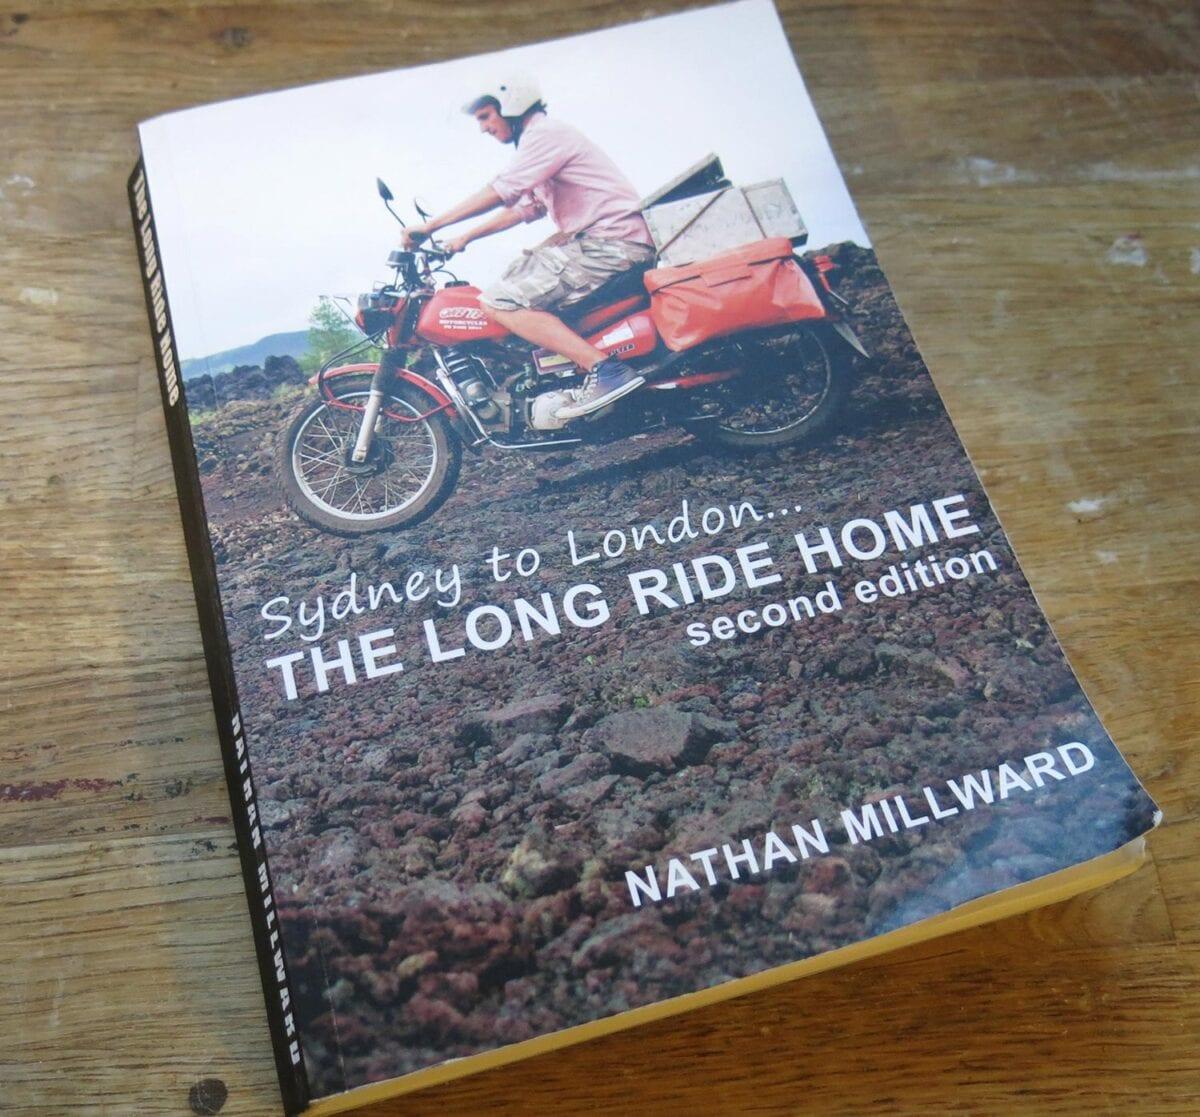 Long-ride-home-1